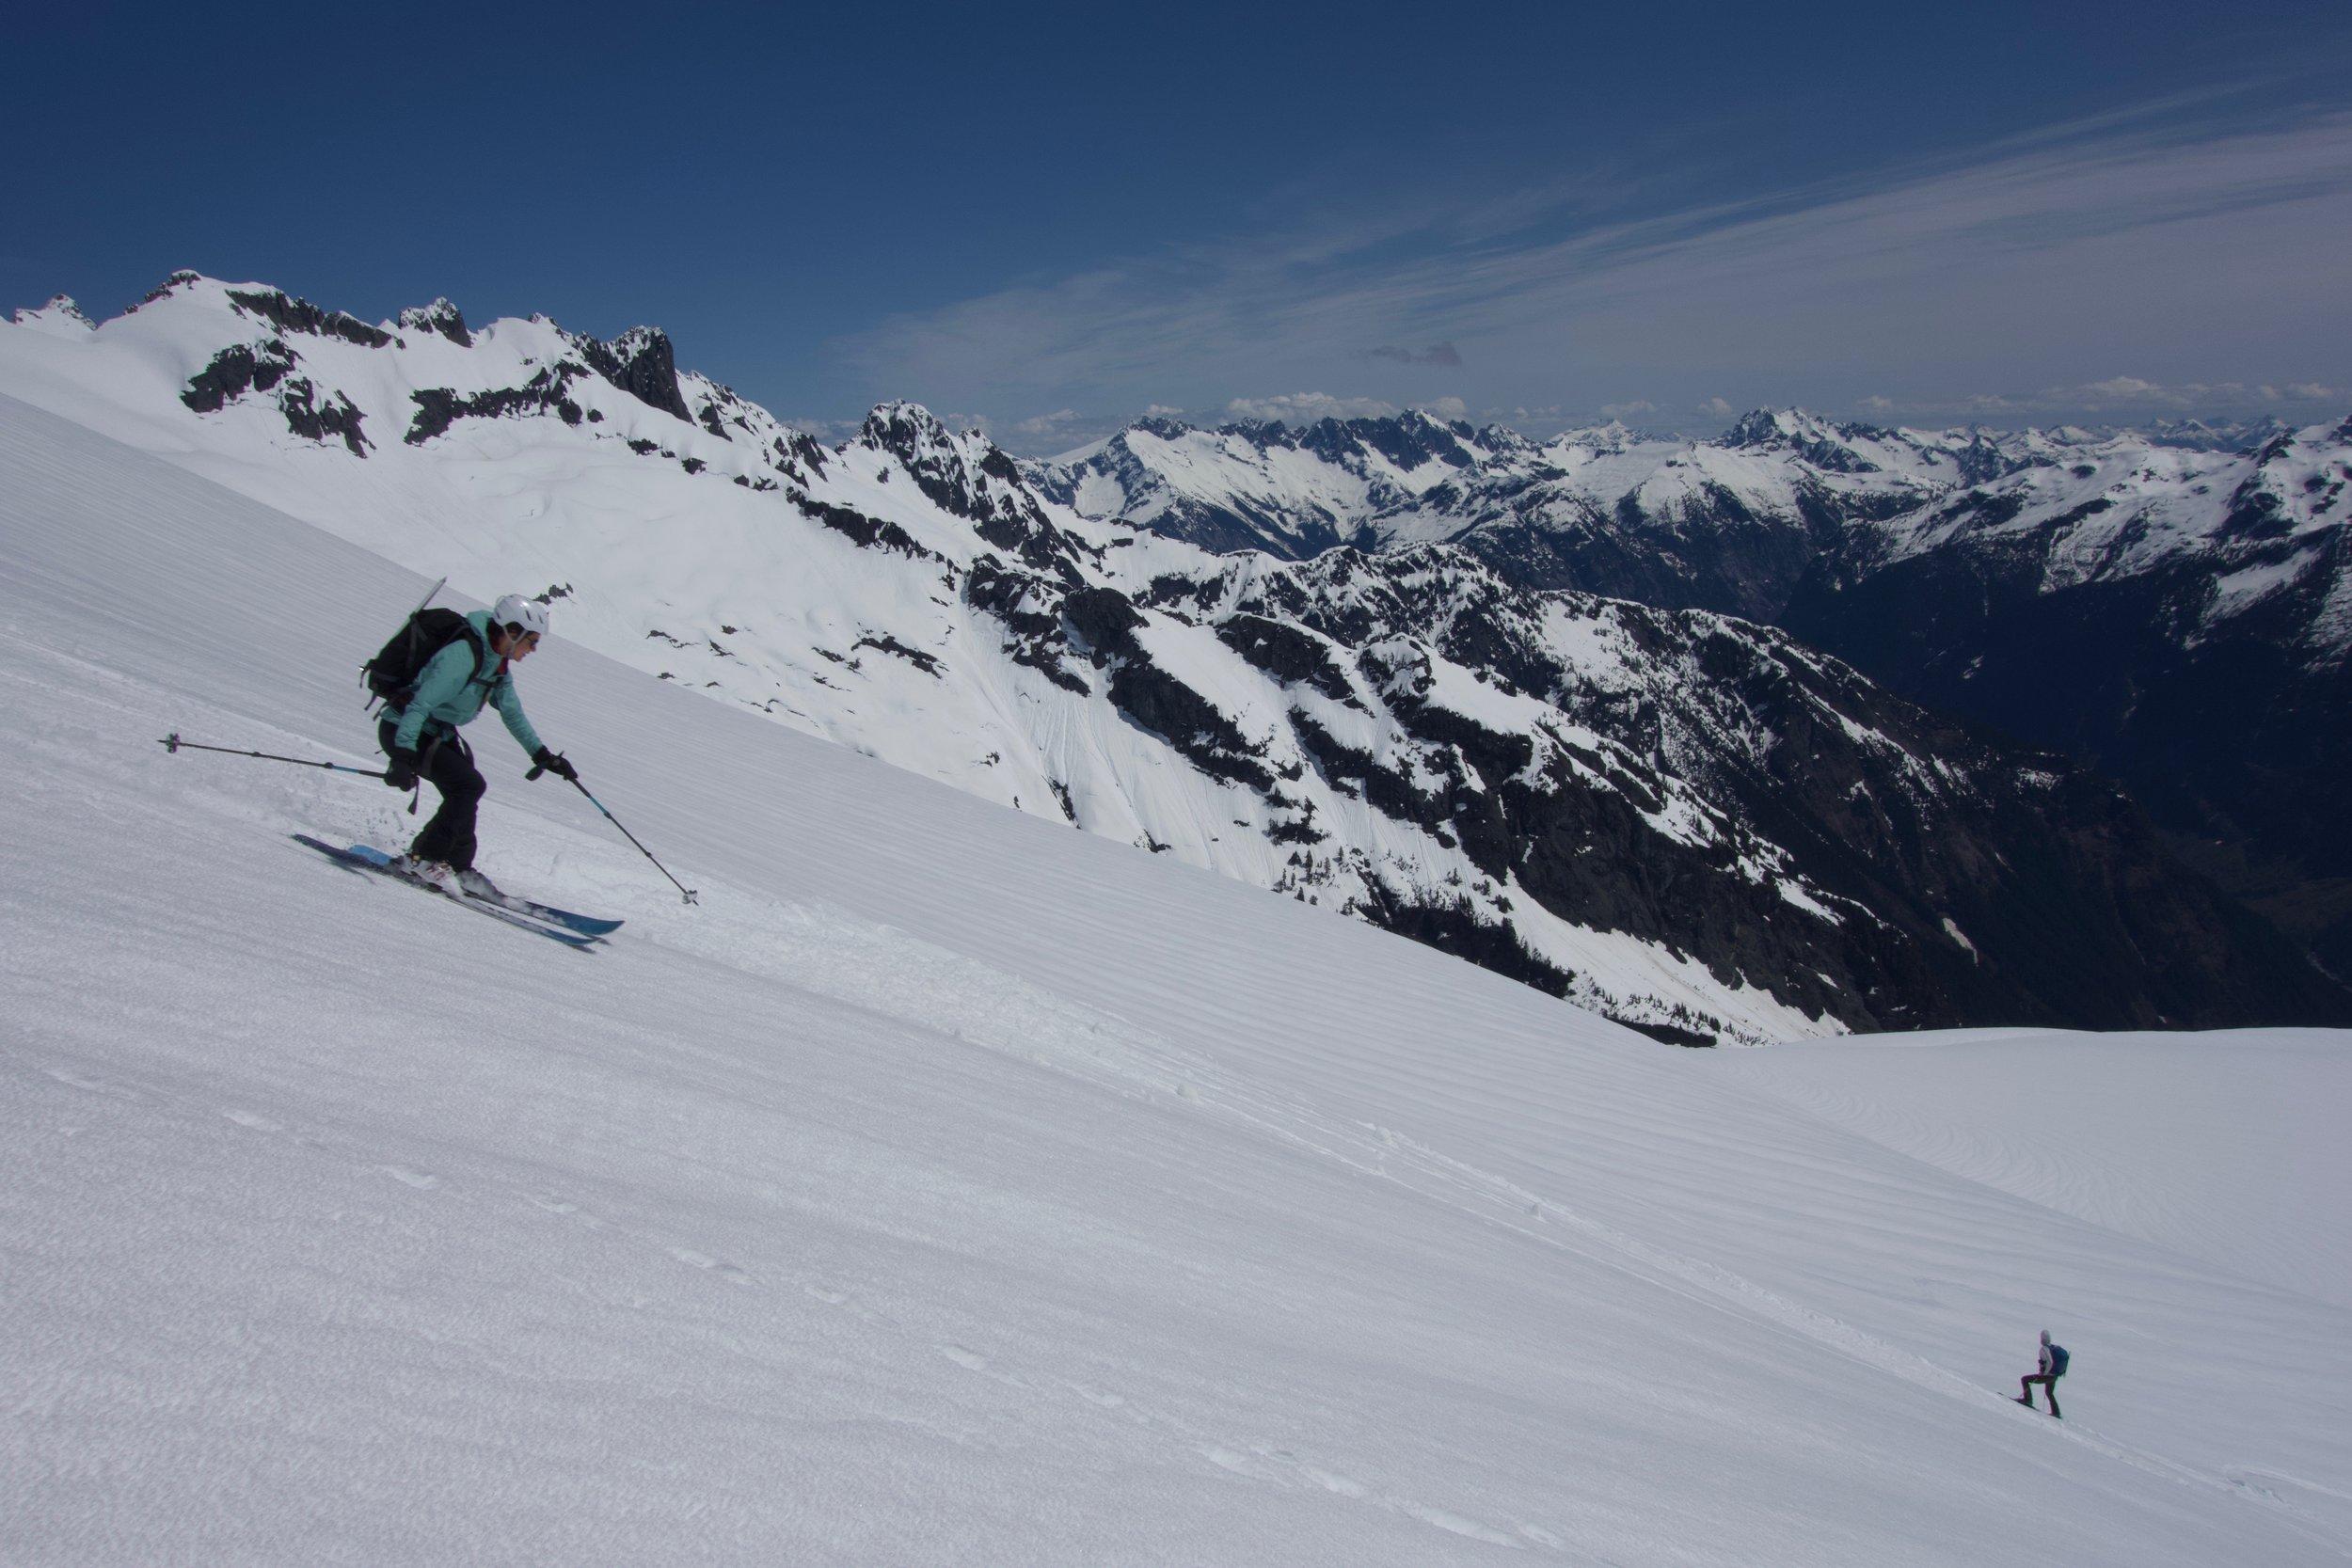 Enjoying the ski before it got really wet